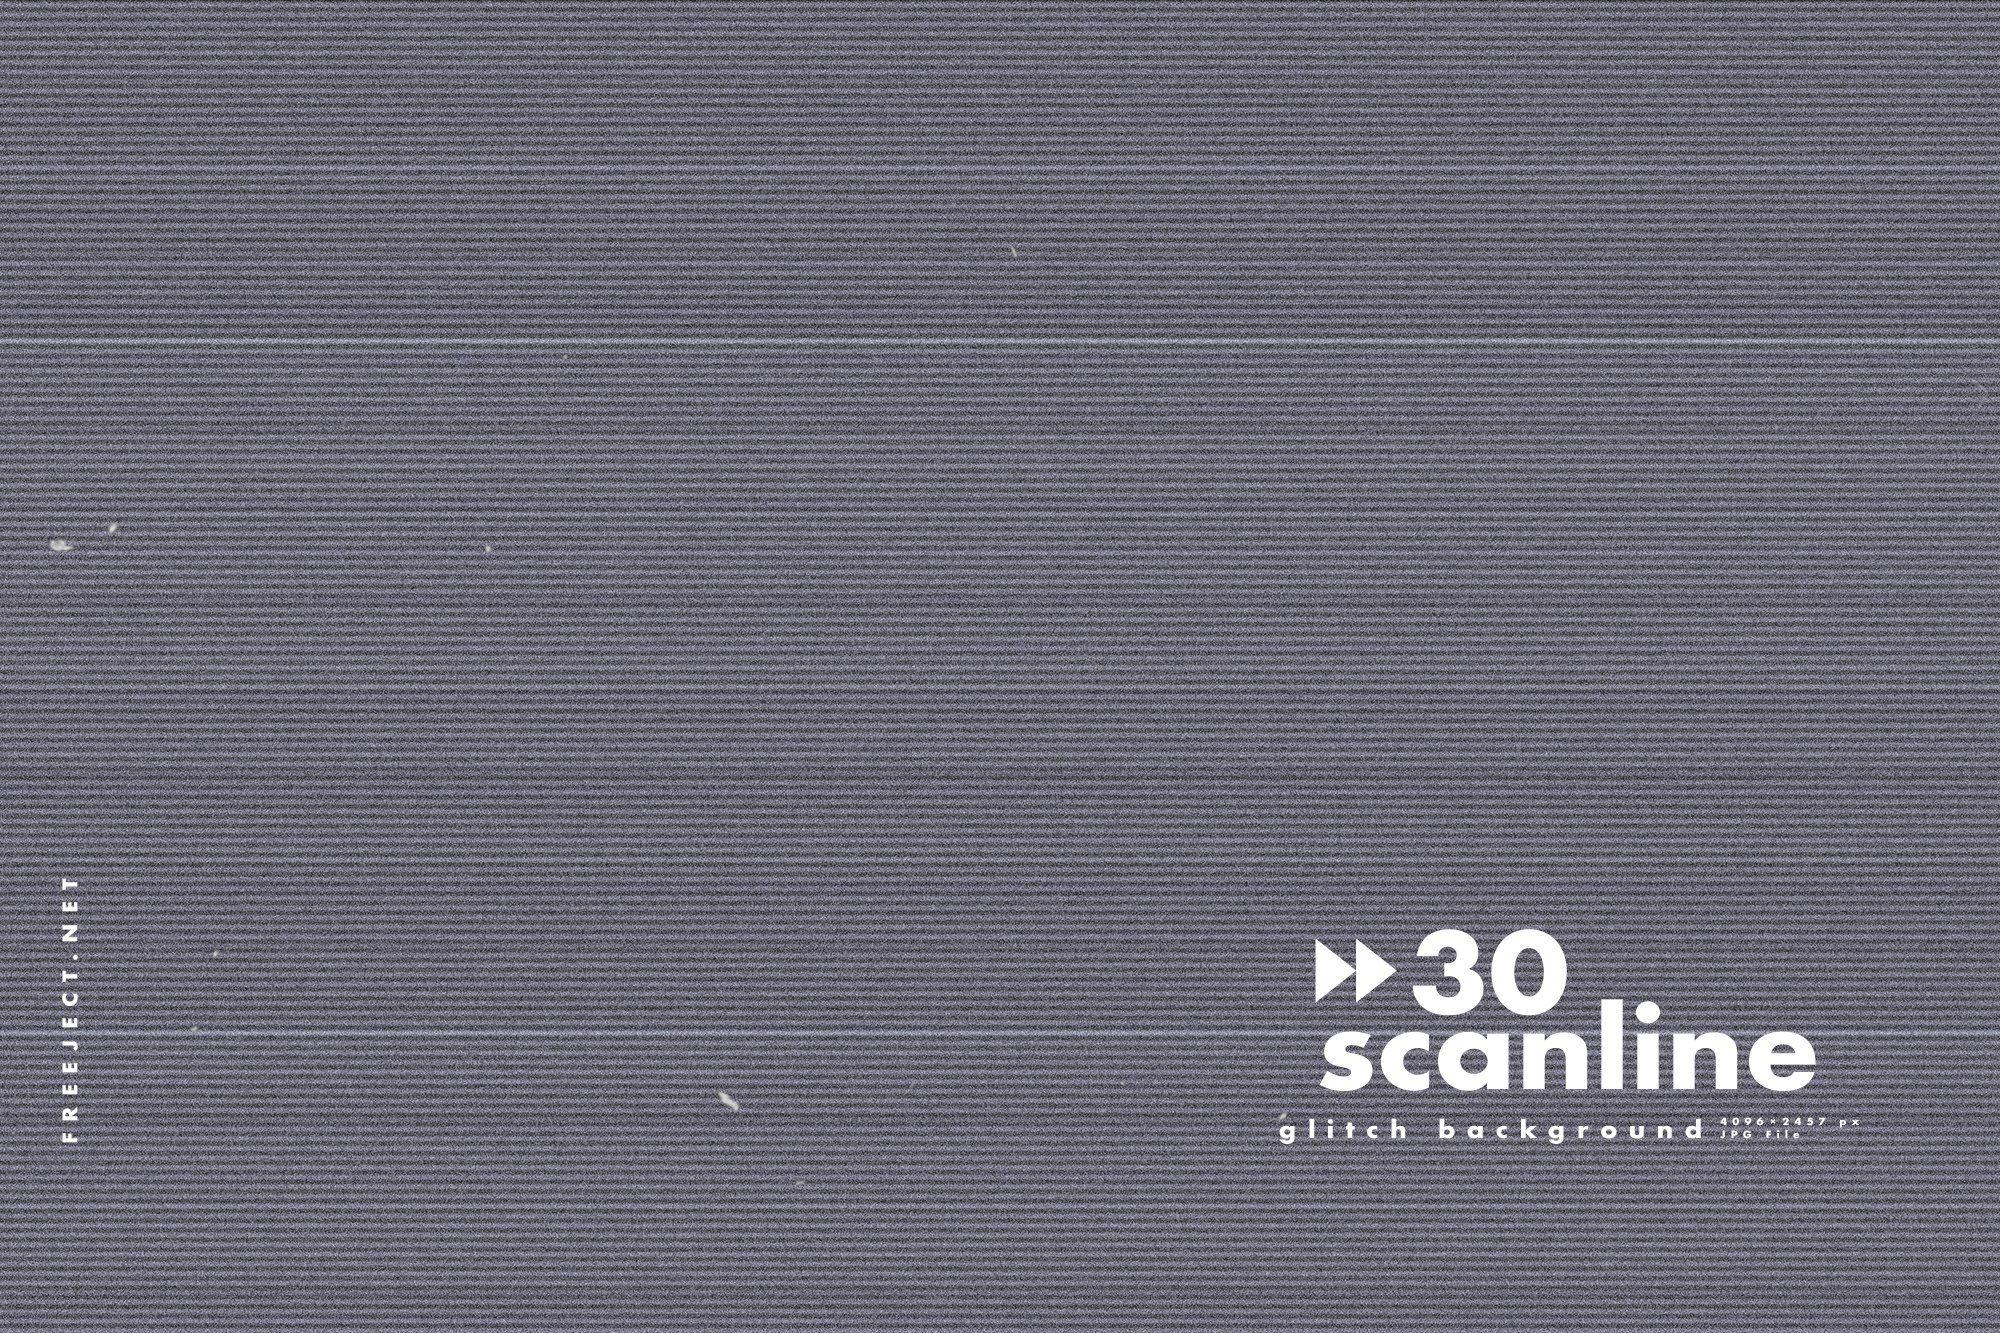 30 Scan Lines Glitch Background Line Background Poster Prints Glitch